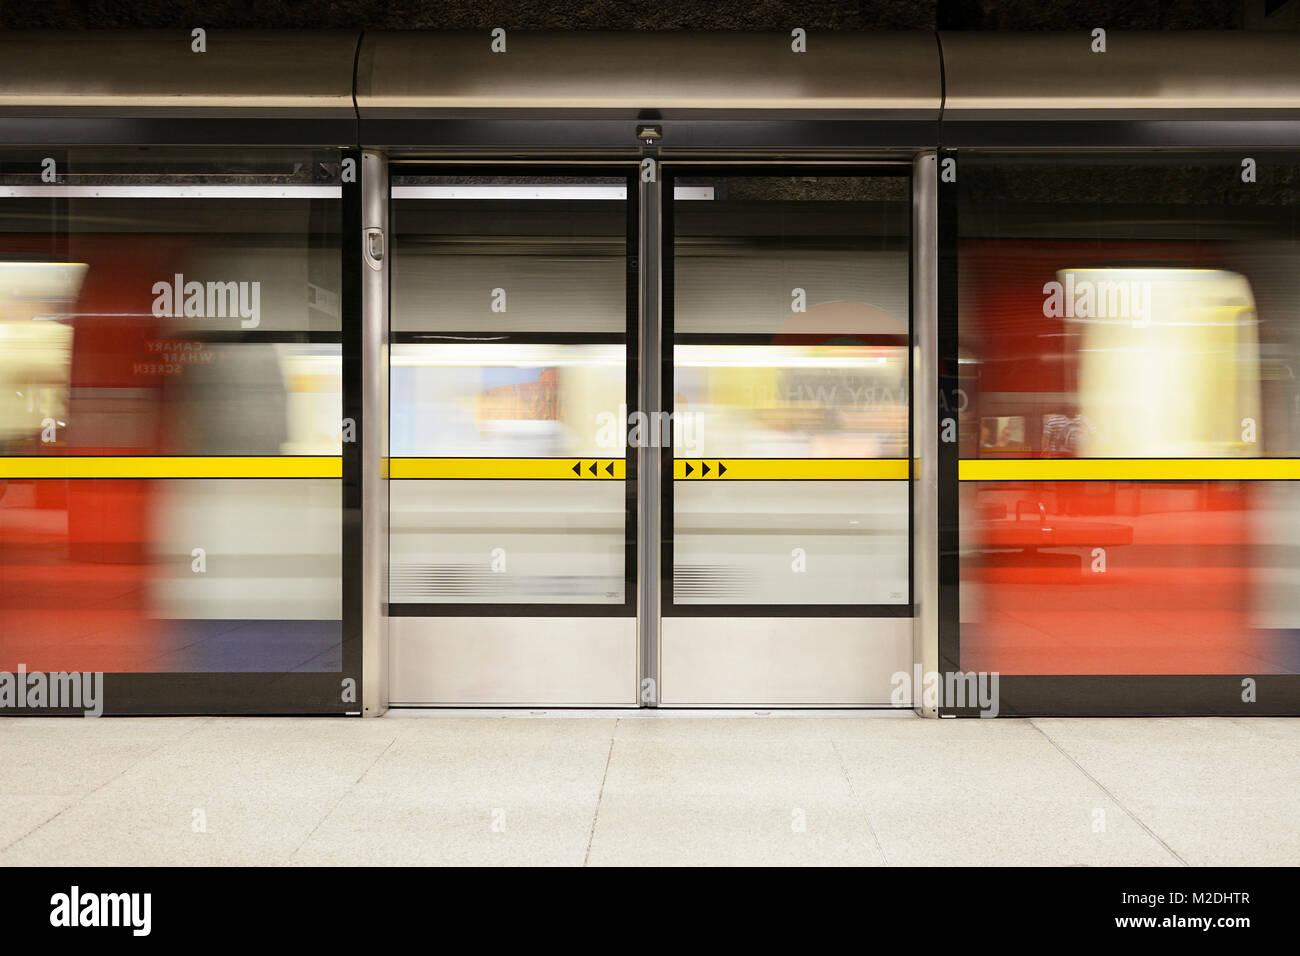 Platform Screen Doors sulla metropolitana di Londra a Canary Wharf Station di Londra, Regno Unito Immagini Stock